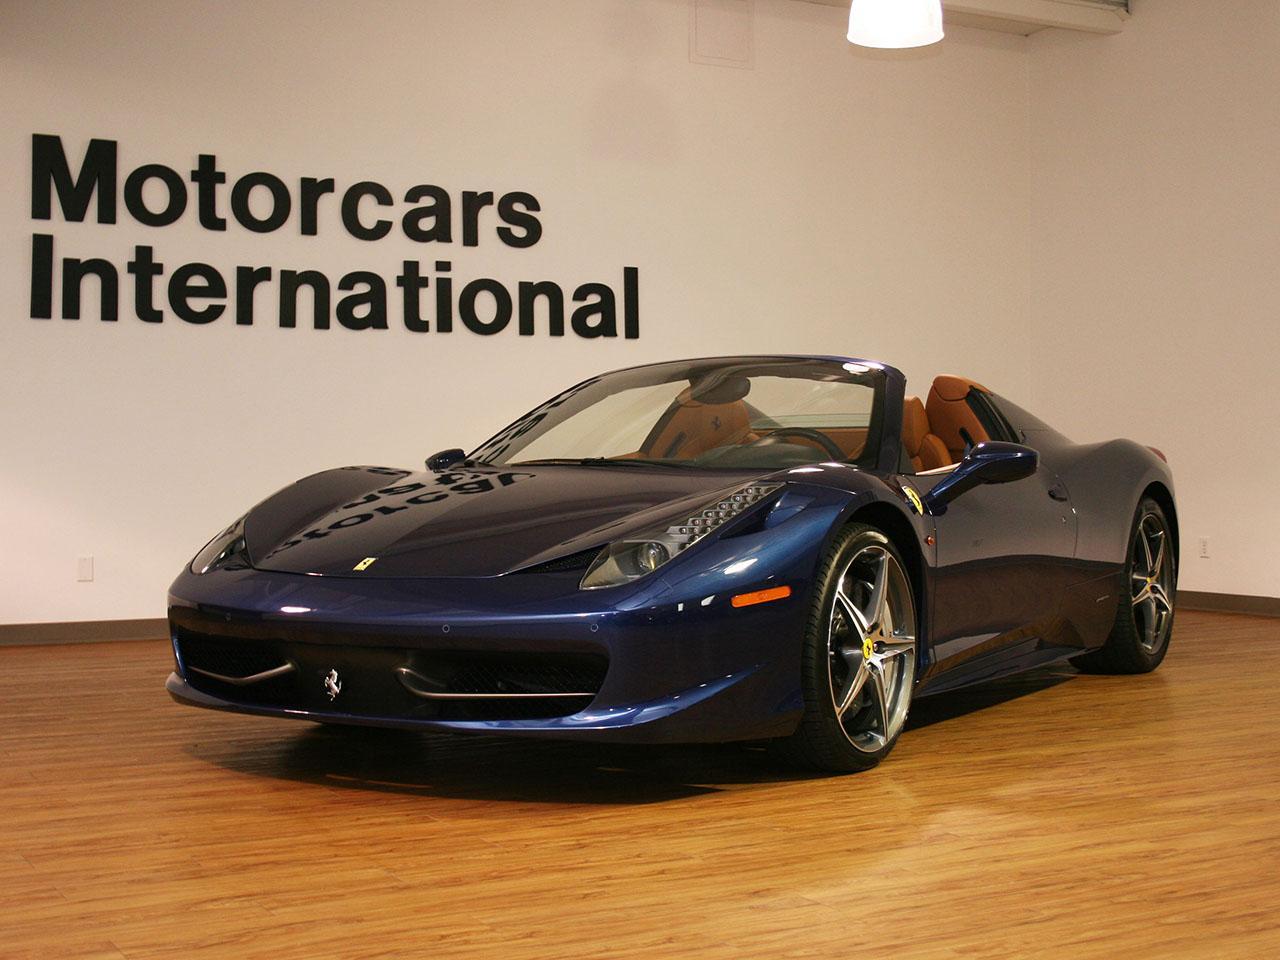 2013 ferrari 458 italia spider. Cars Review. Best American Auto & Cars Review